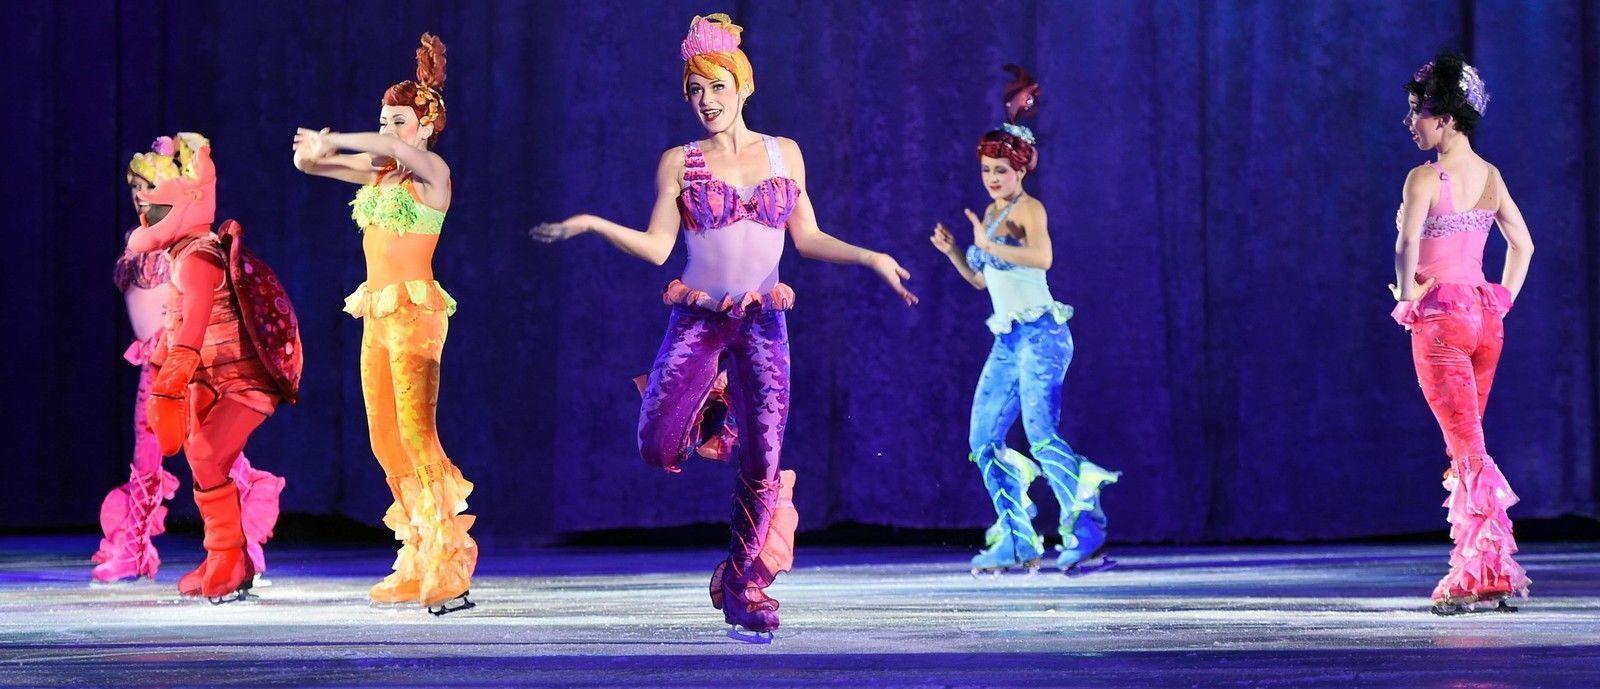 Disney on Ice Dare to Dream Boston